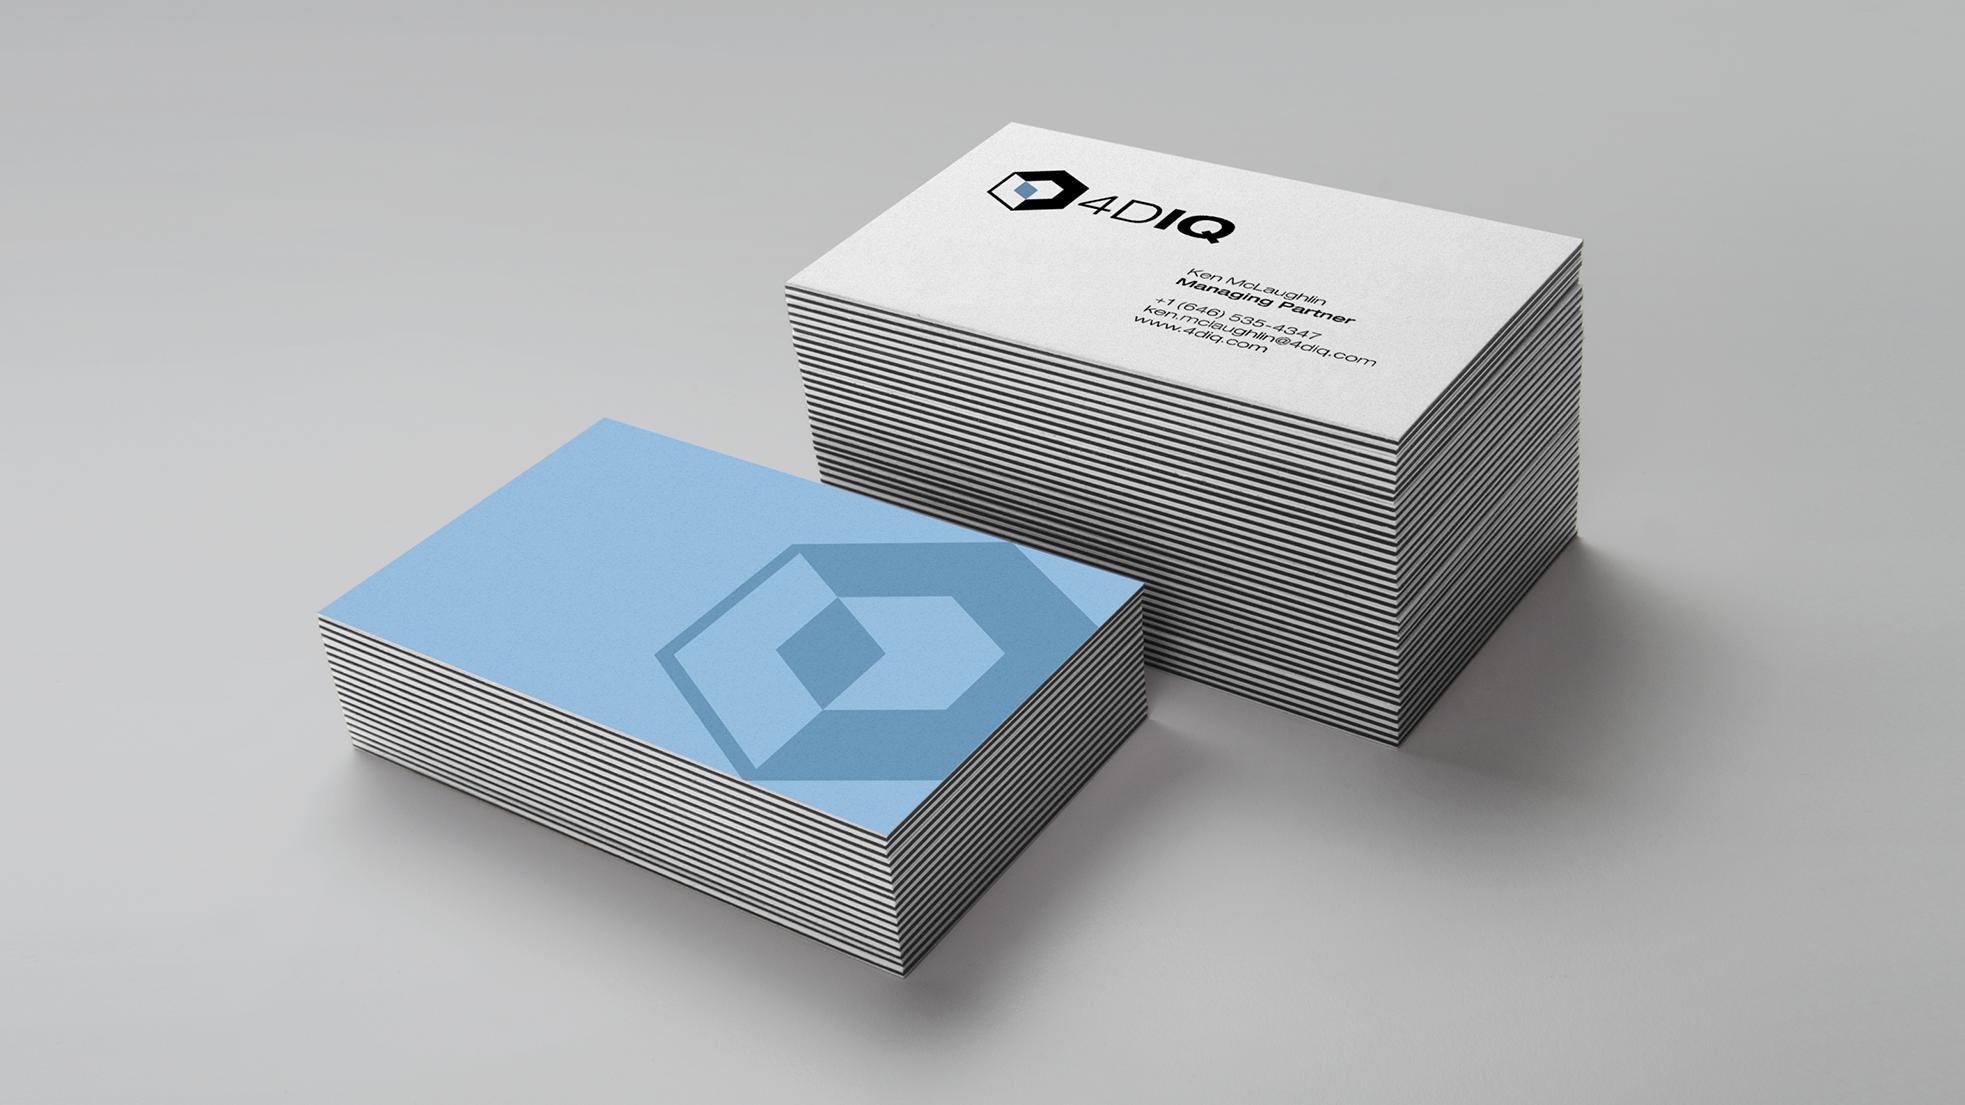 4DIQ business cards